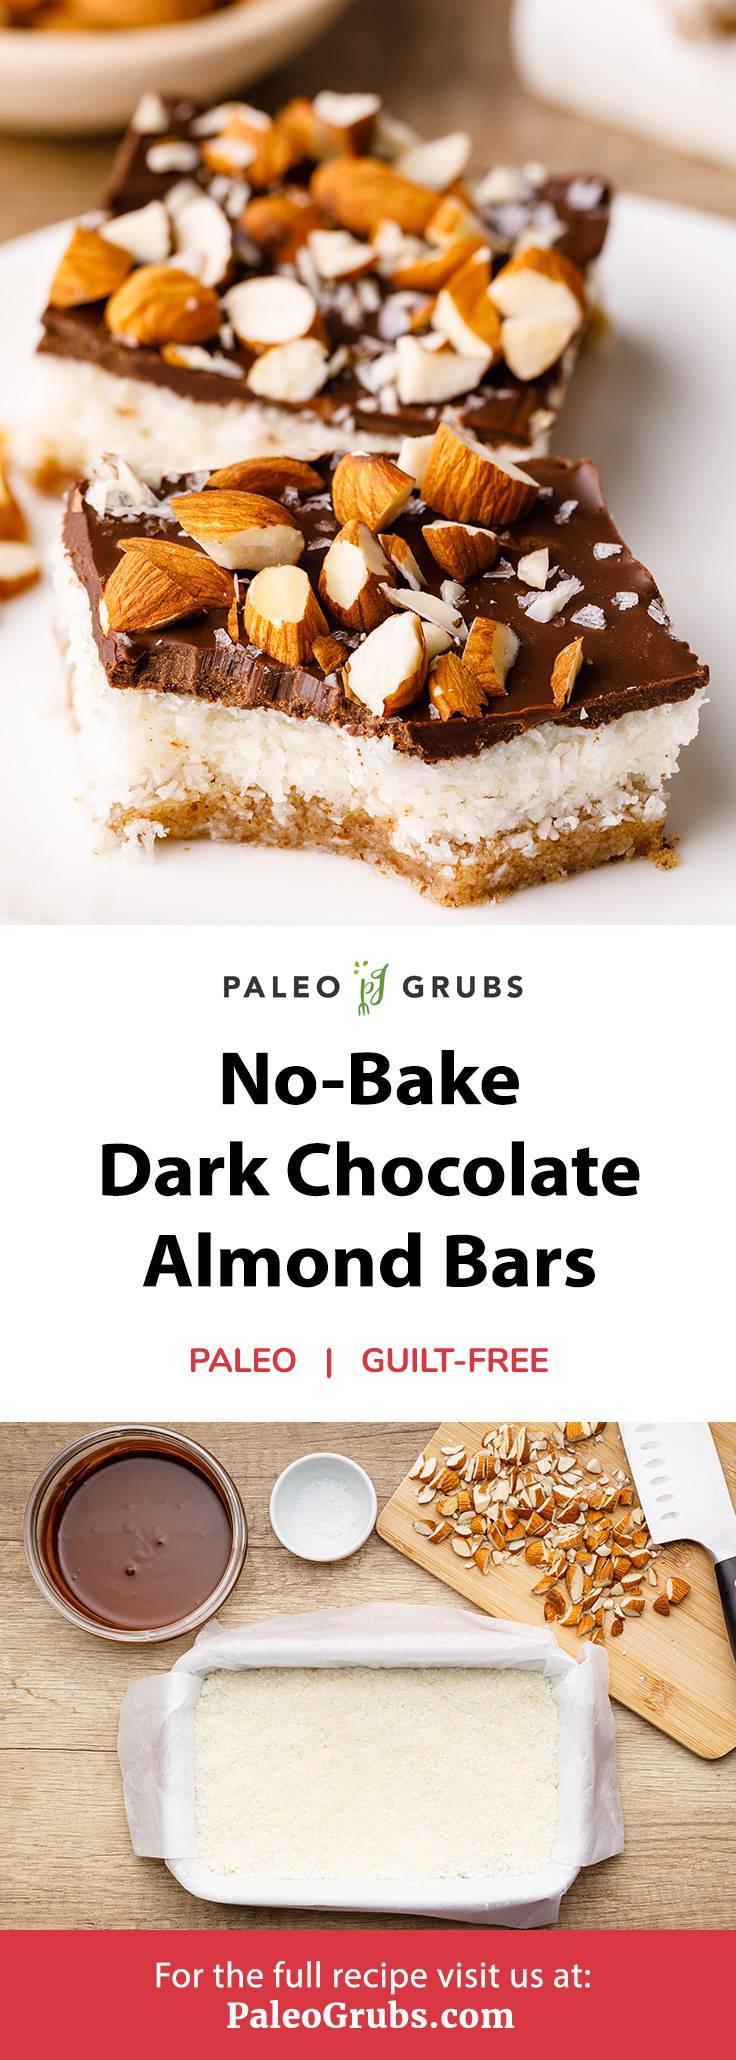 No-Bake Salted Almond Joy Bars